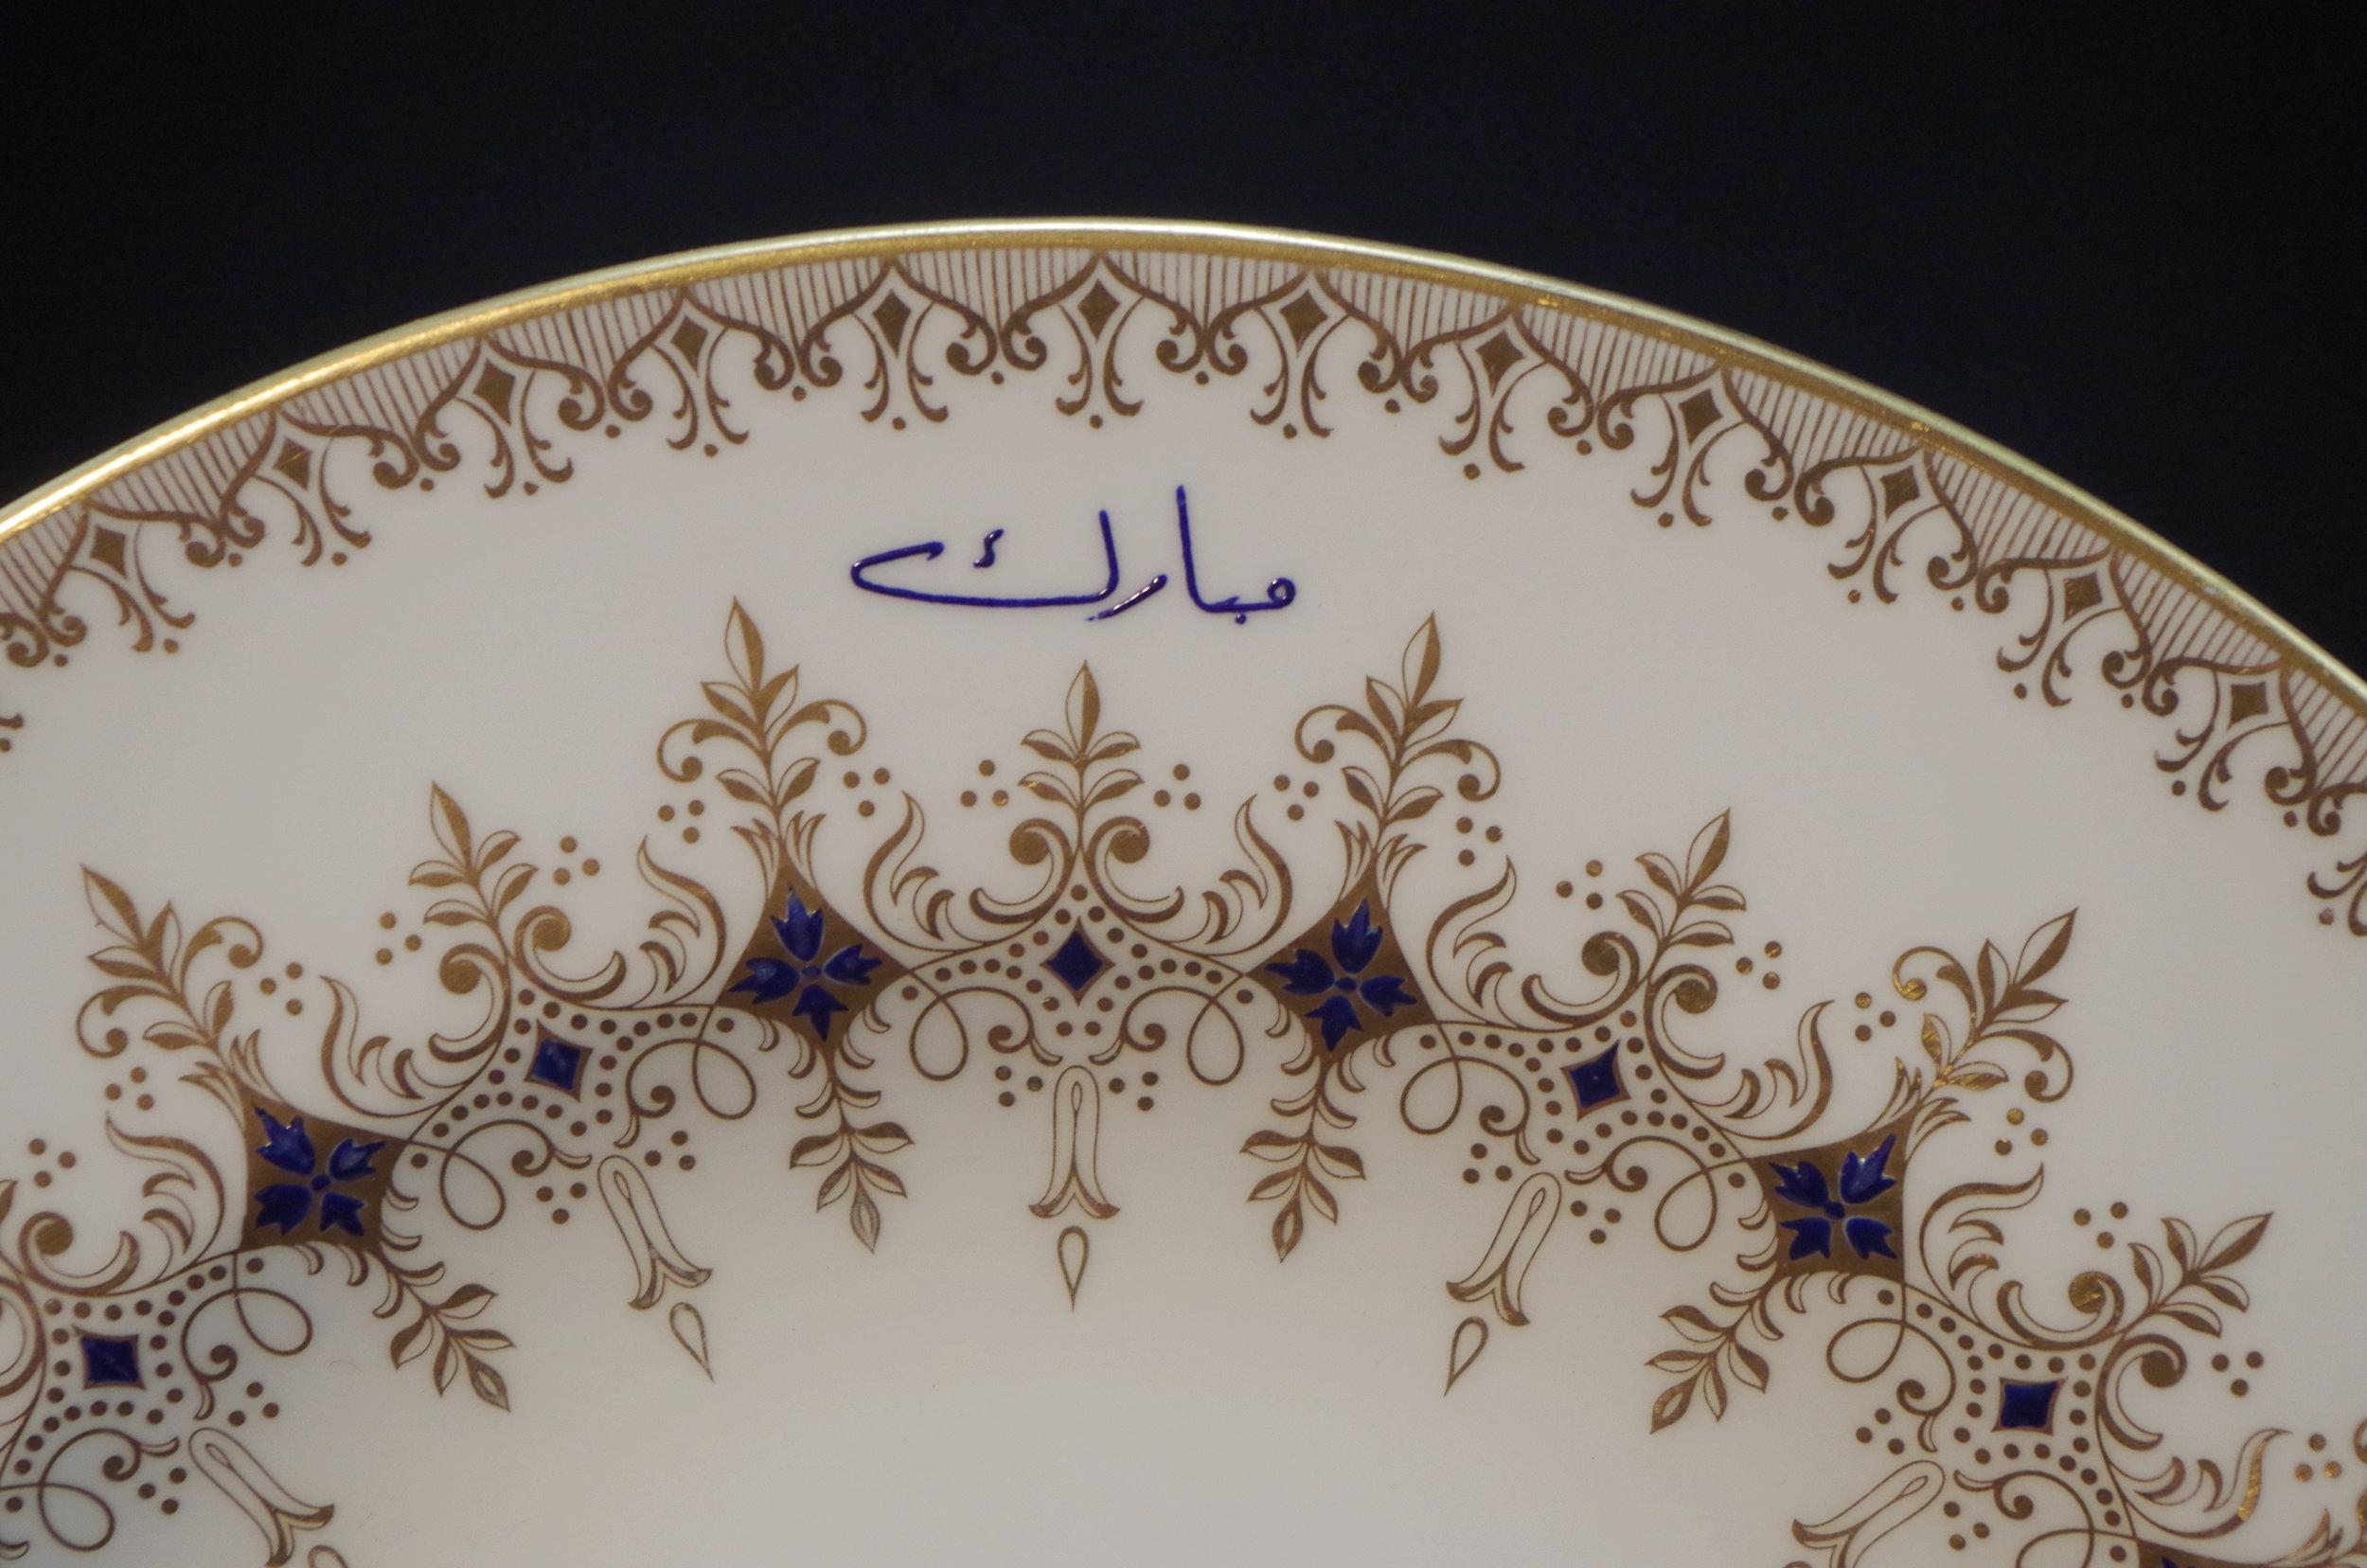 royal-crown-derby-honiton-mubarak-A1231-inscription-close-up